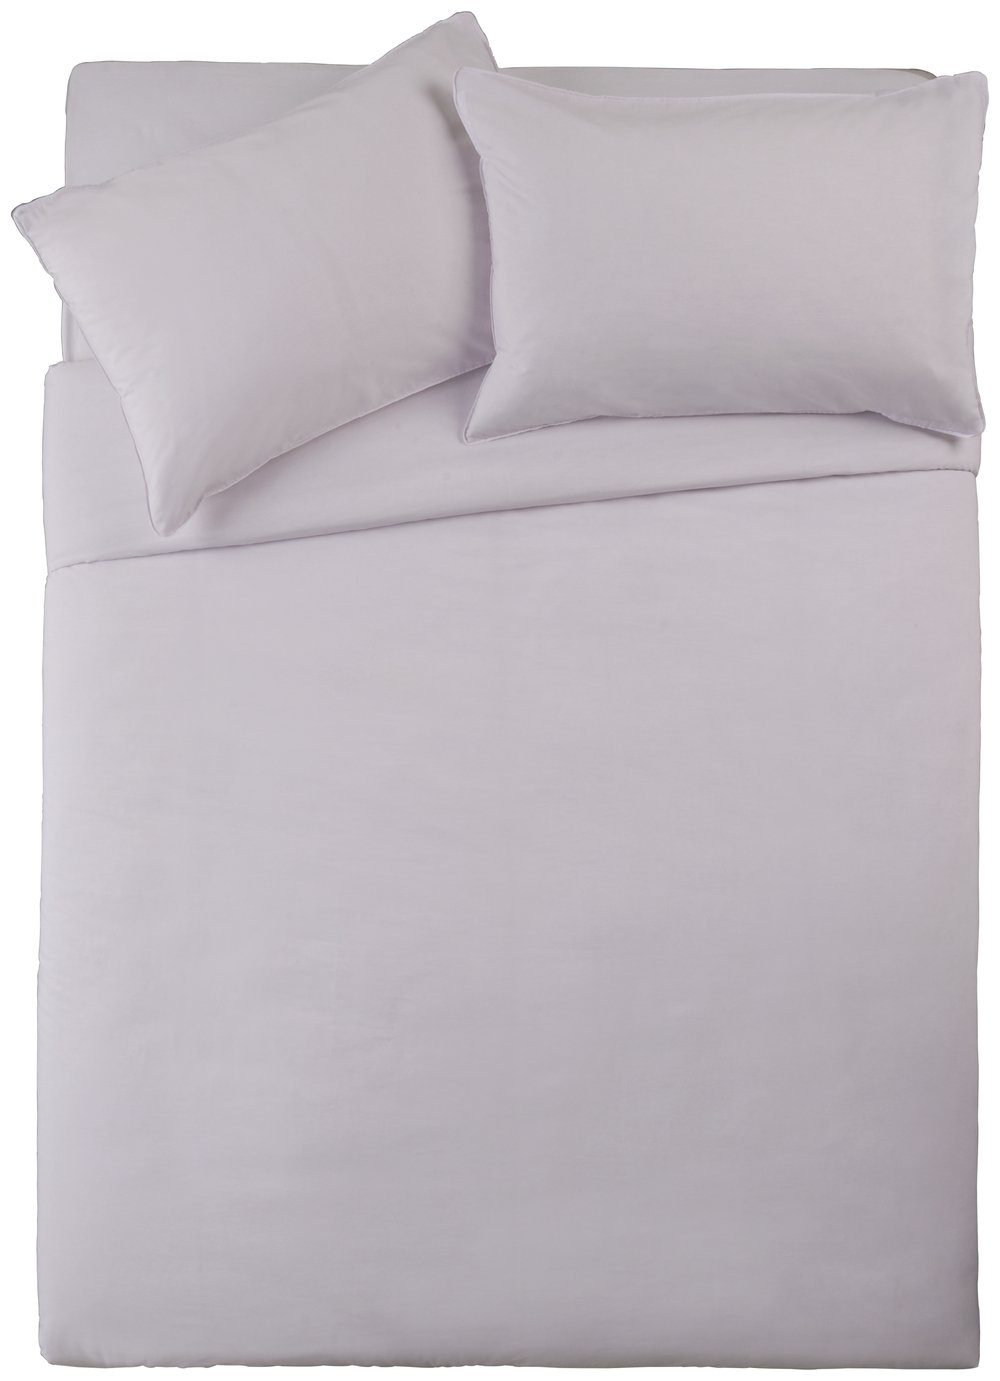 Argos Home White Cotton Rich Bedding Set review